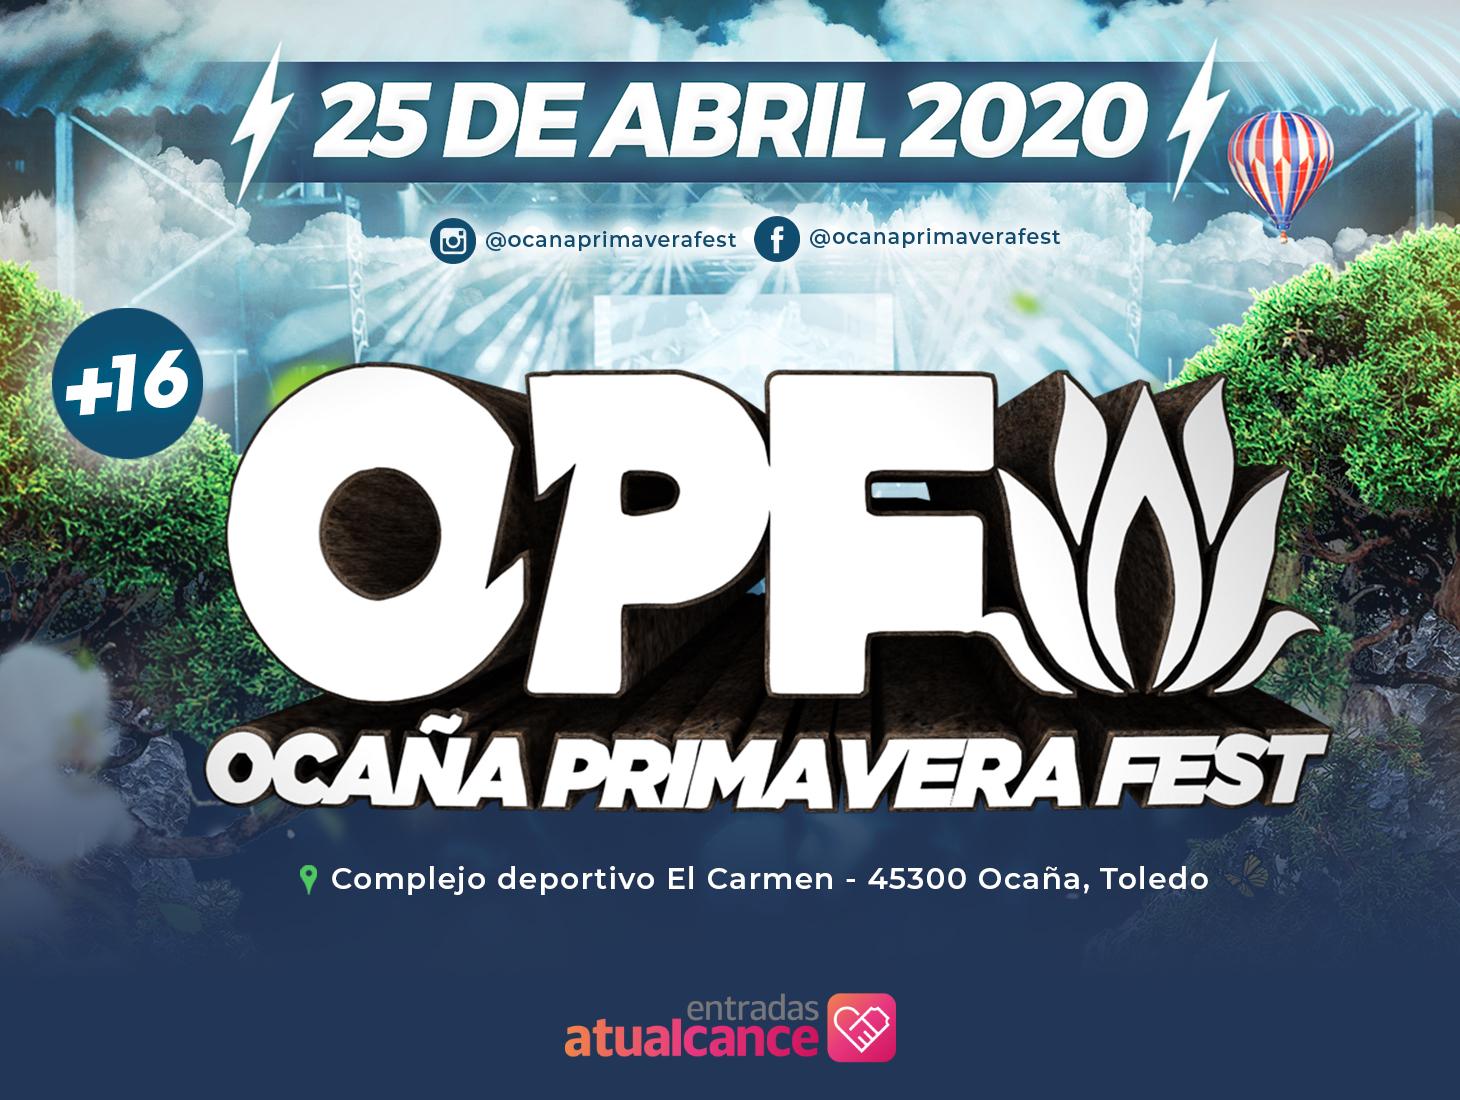 ocana-primavera-fest-2020-5e3ab16994e9c.jpeg